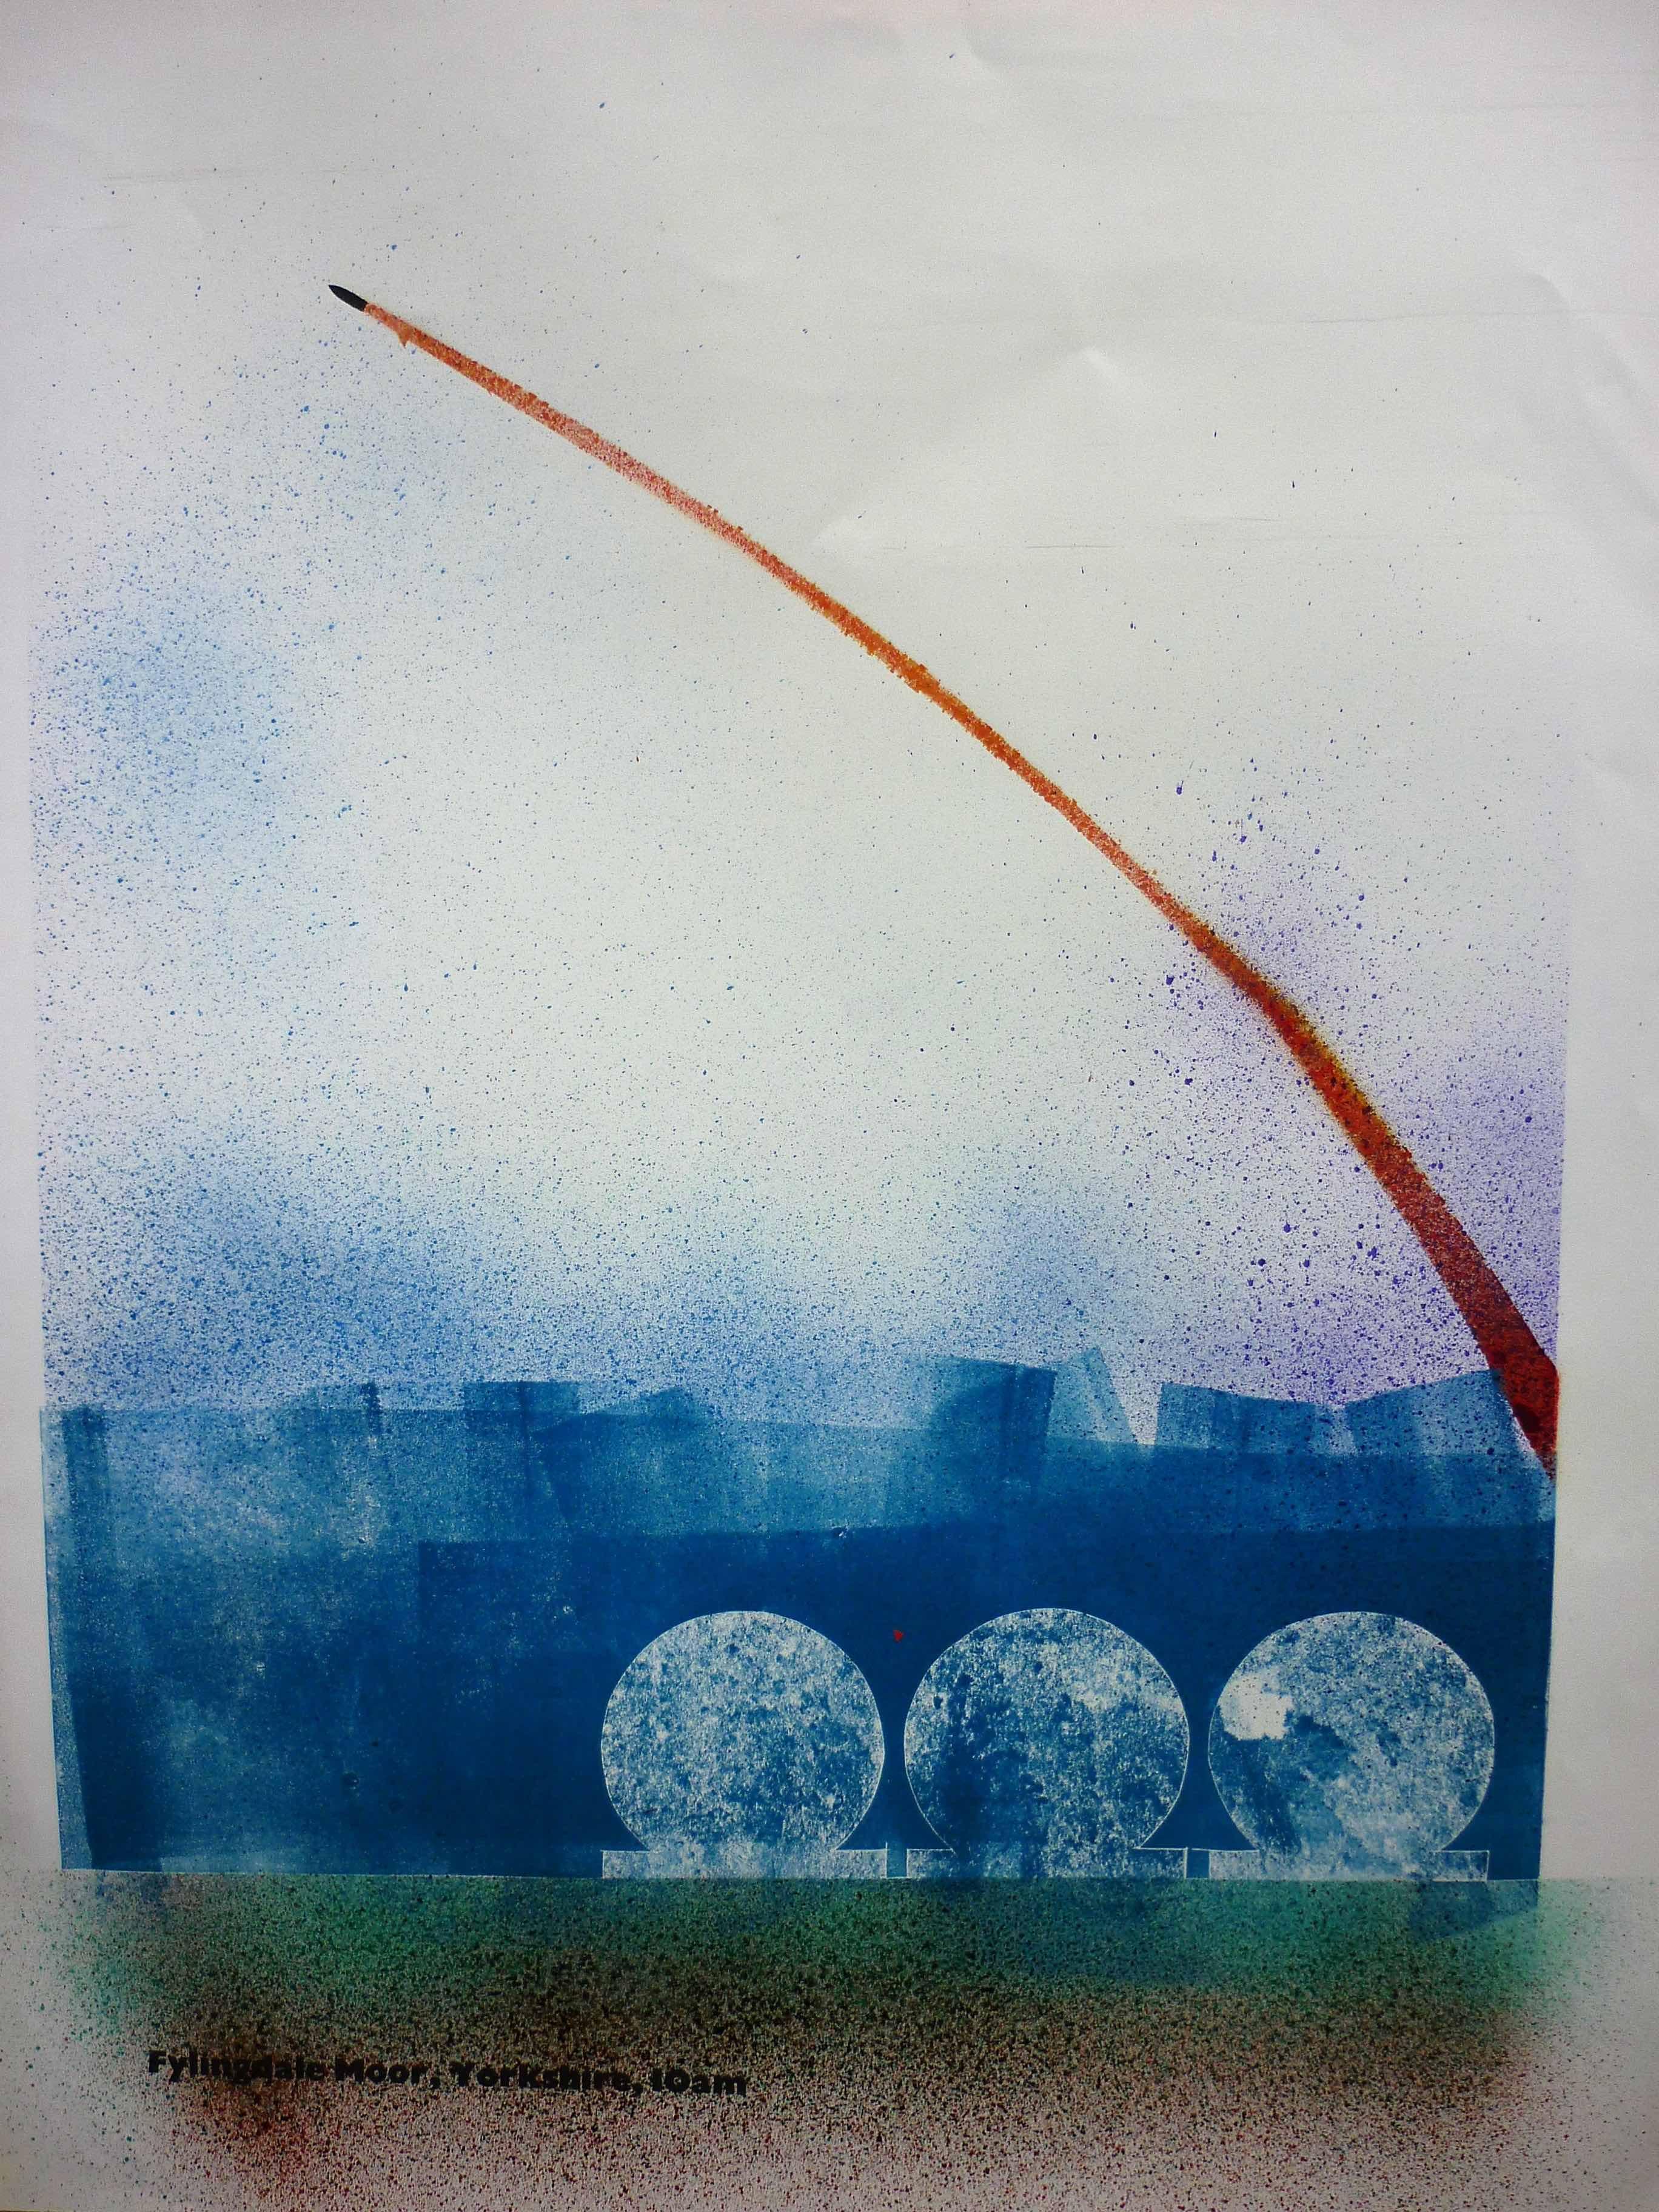 Jeff Perks-Fylingdale Moor. Yorkshire.10am. Cardboard Cut and Spray. 60x40cm